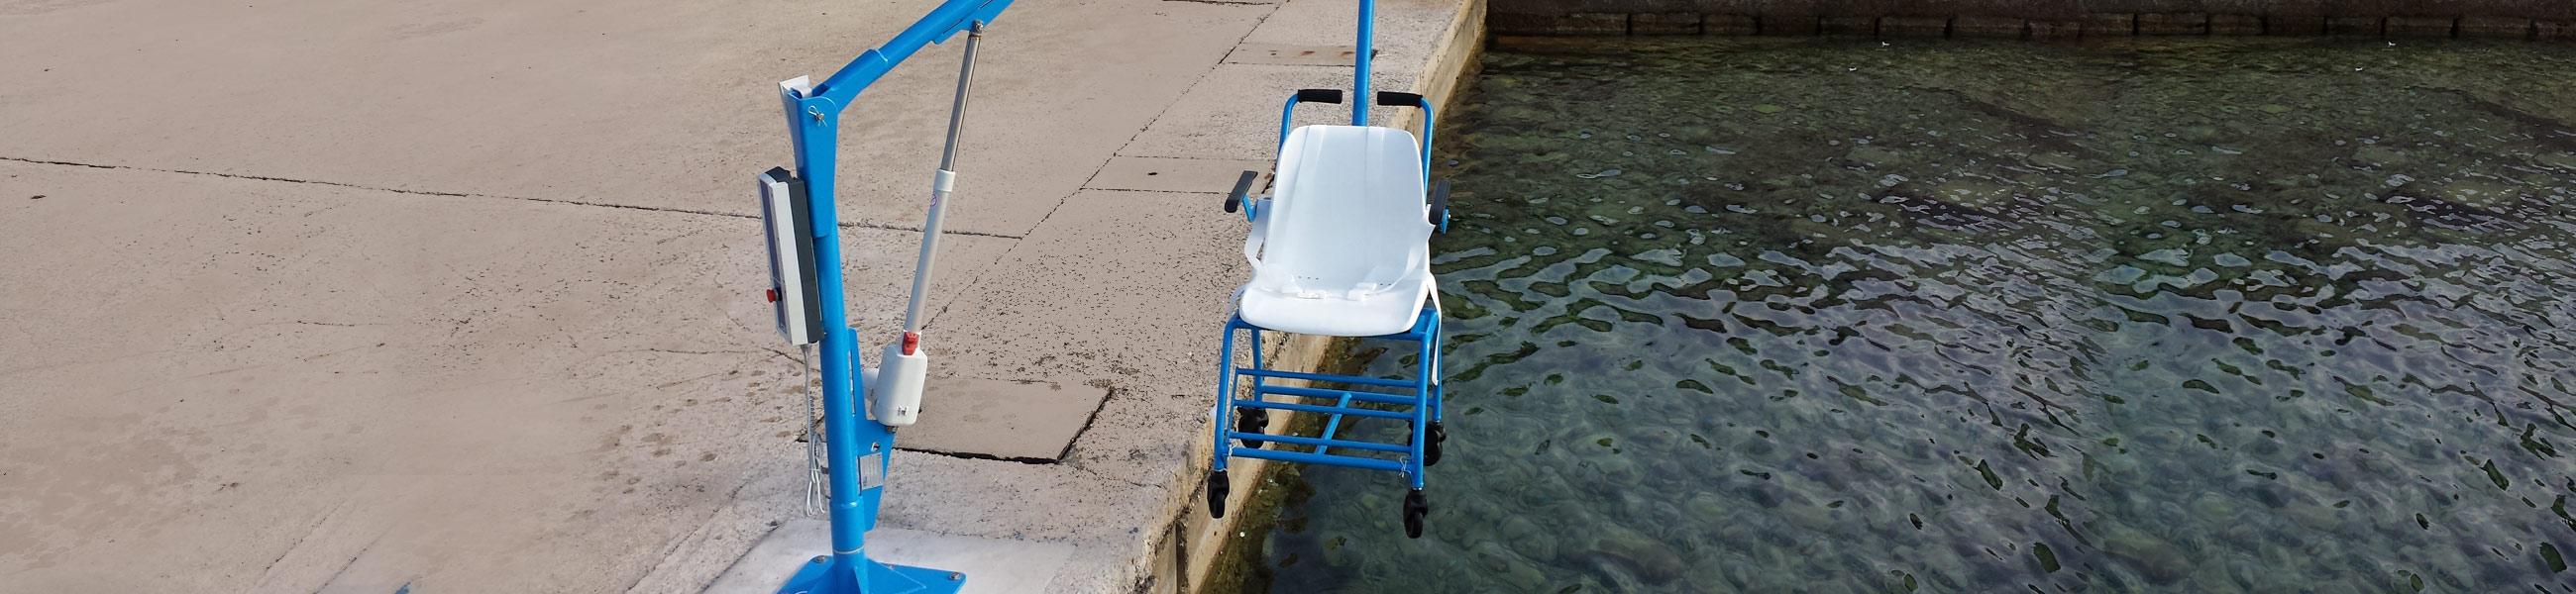 sollevatore fisso disabili piscina